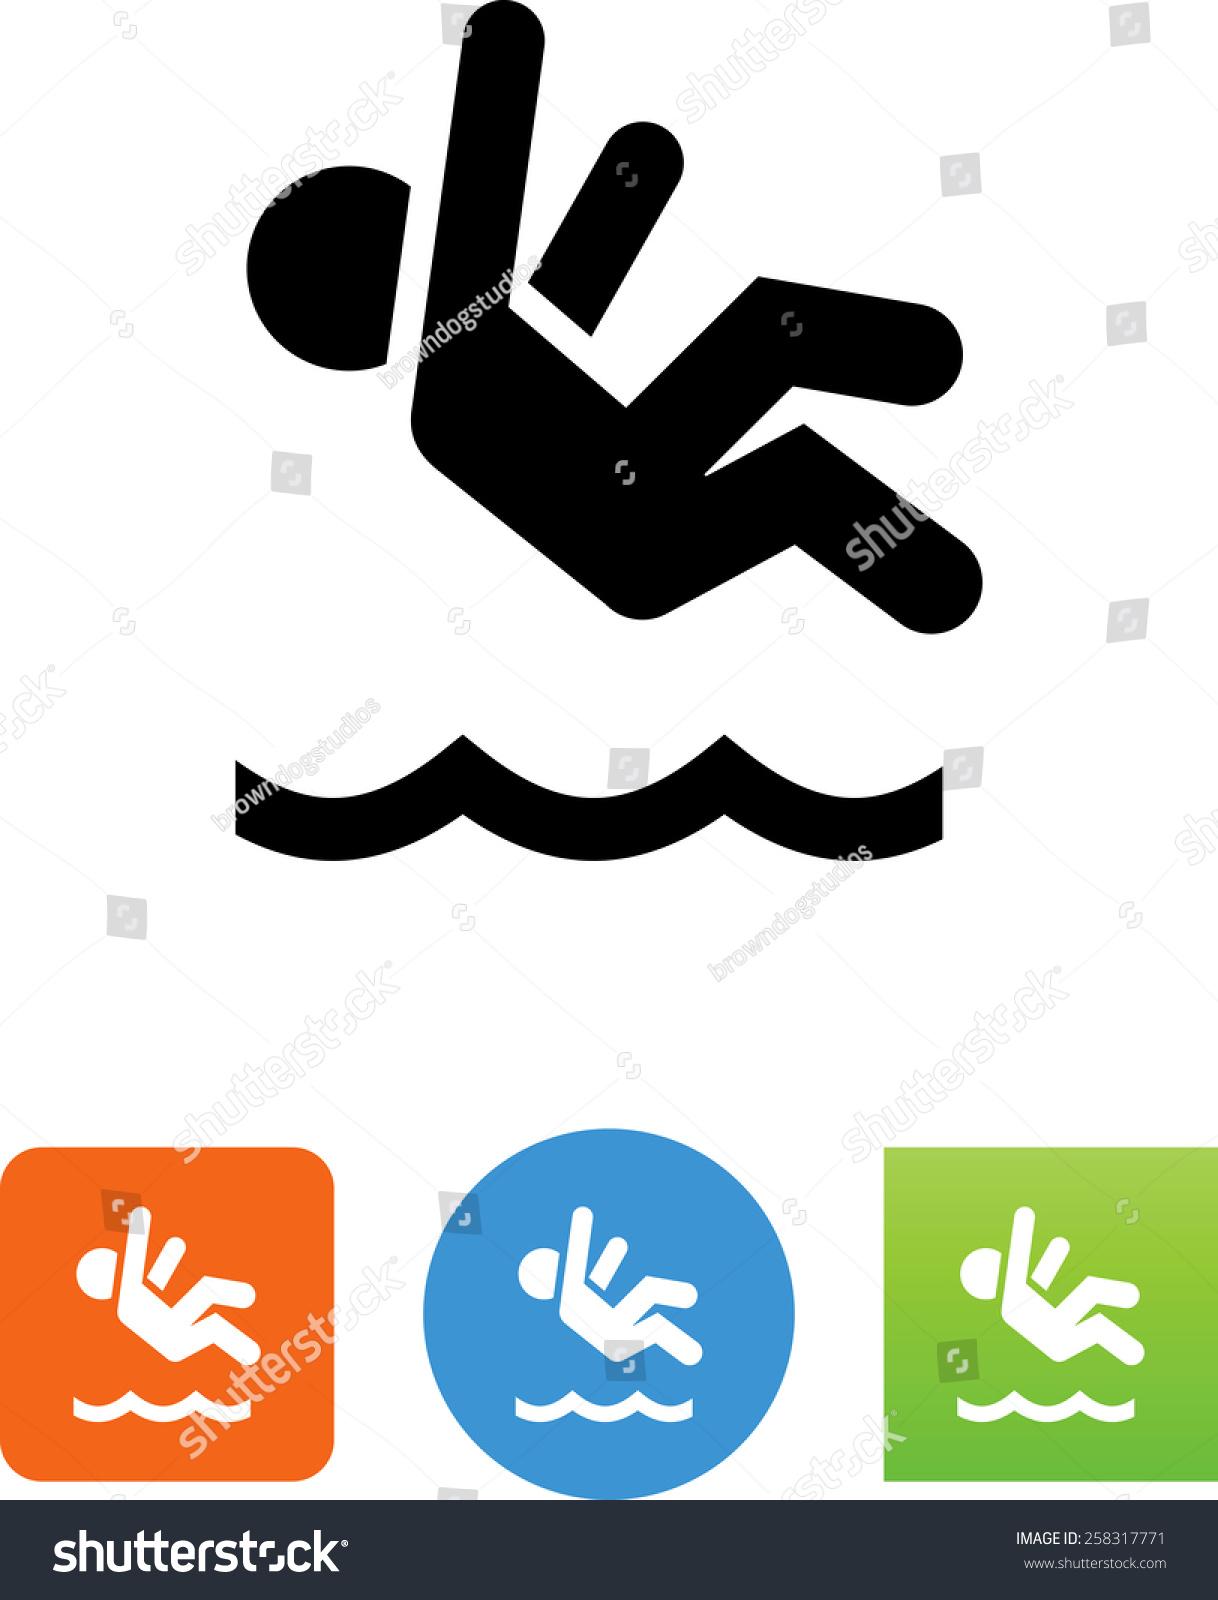 backwards z symbol images reverse search